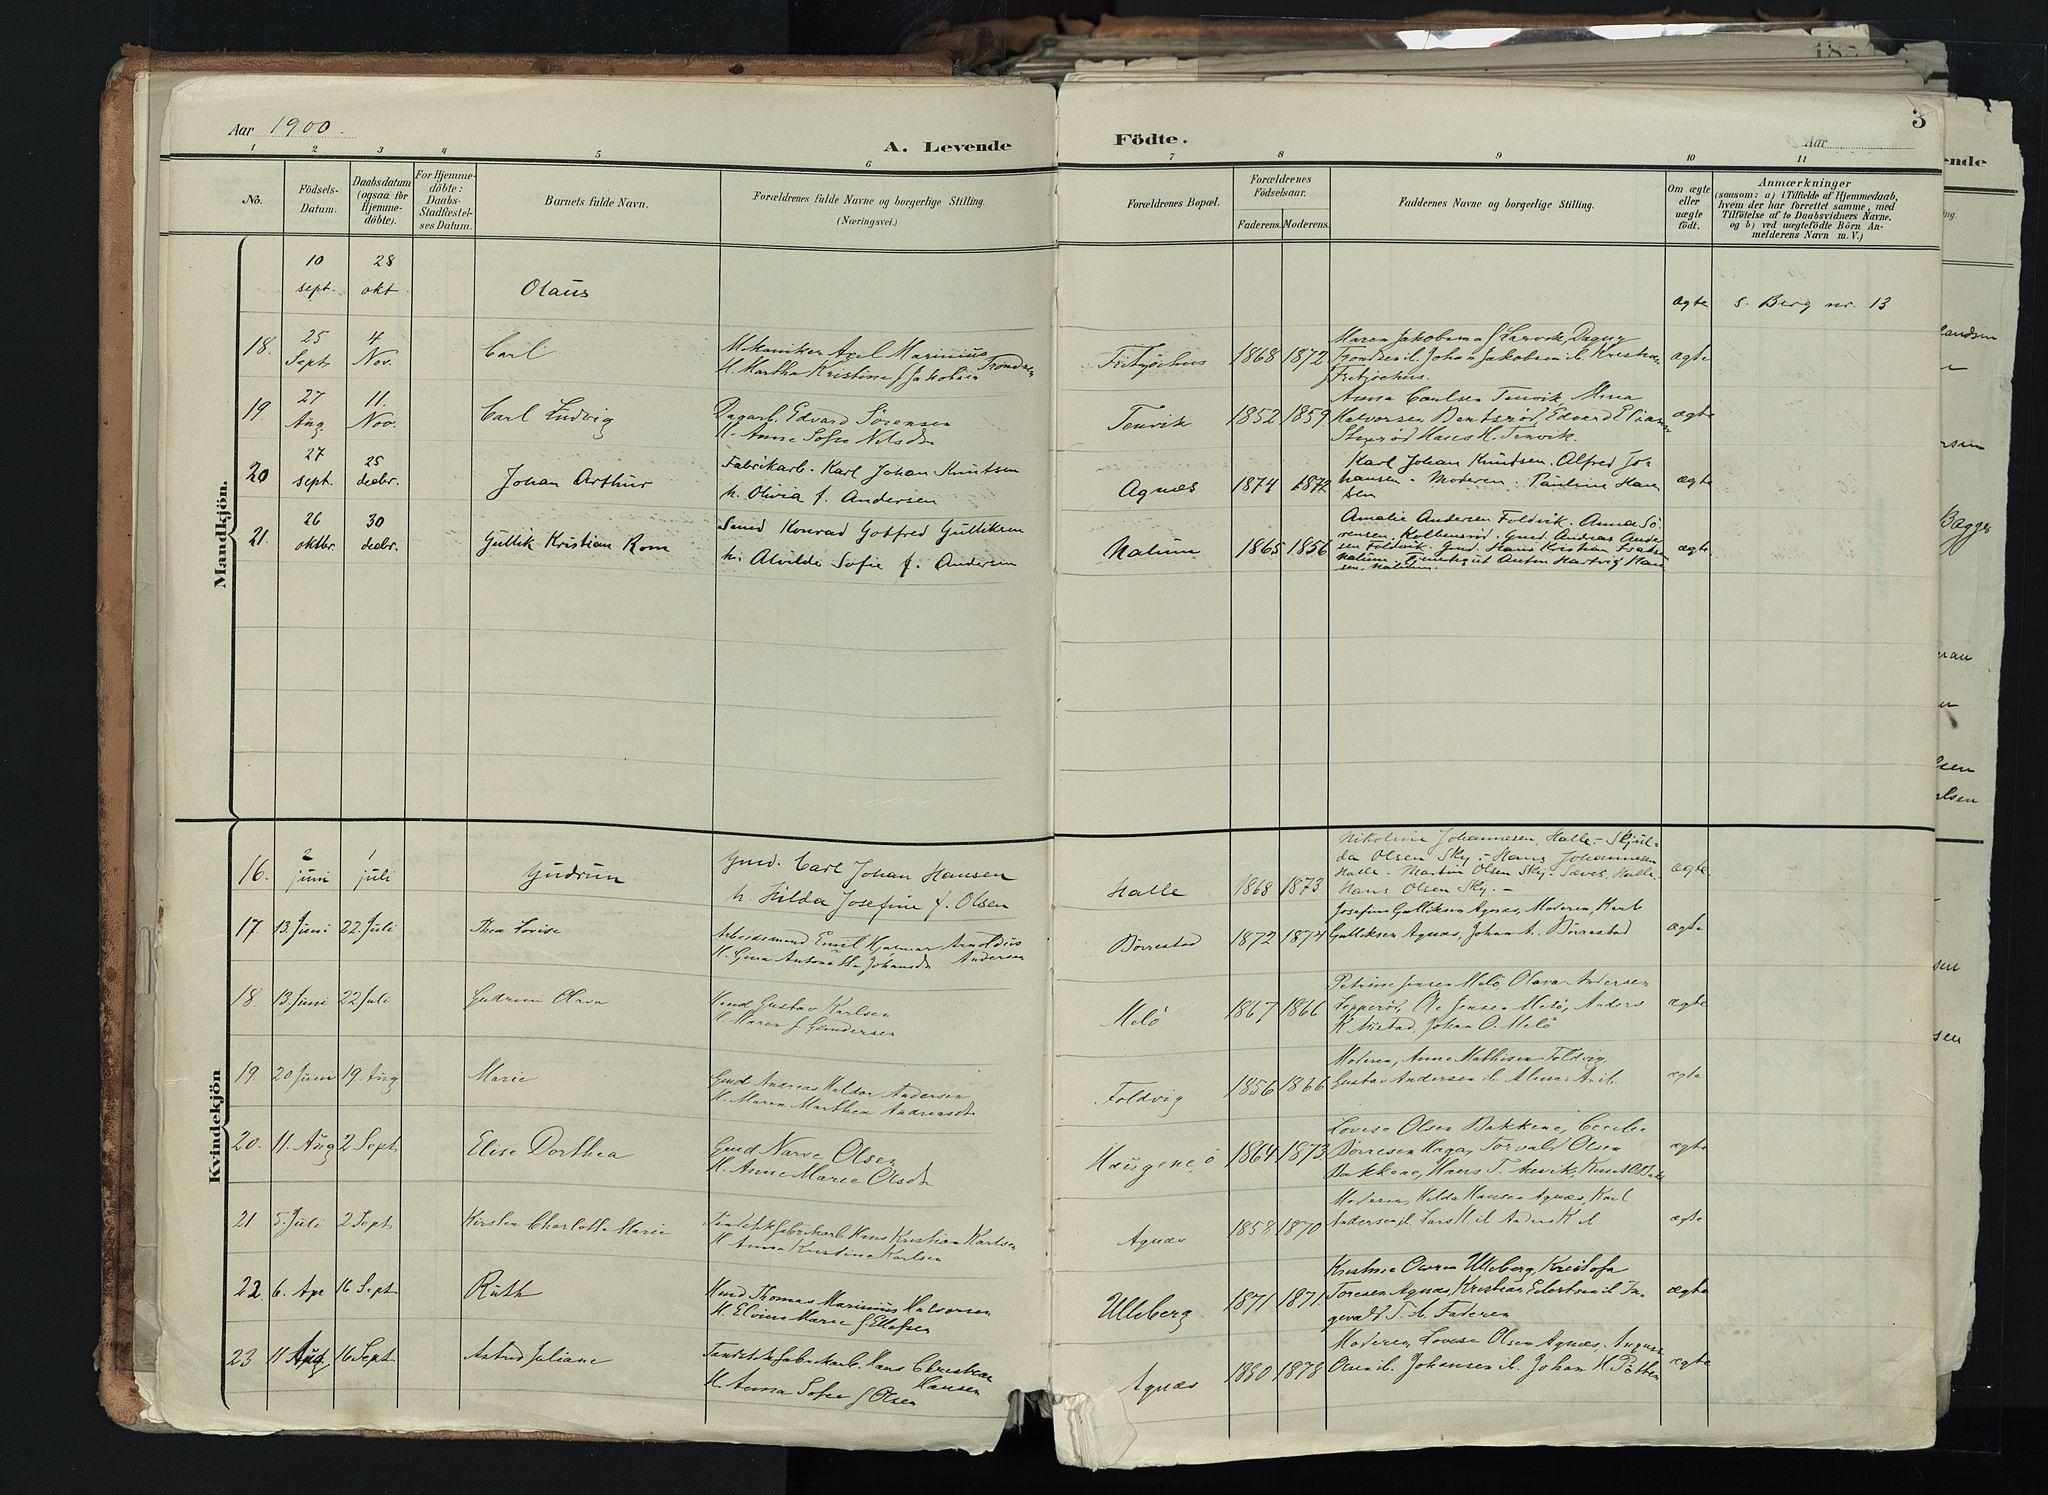 SAKO, Brunlanes kirkebøker, F/Fc/L0003: Ministerialbok nr. III 3, 1900-1922, s. 3